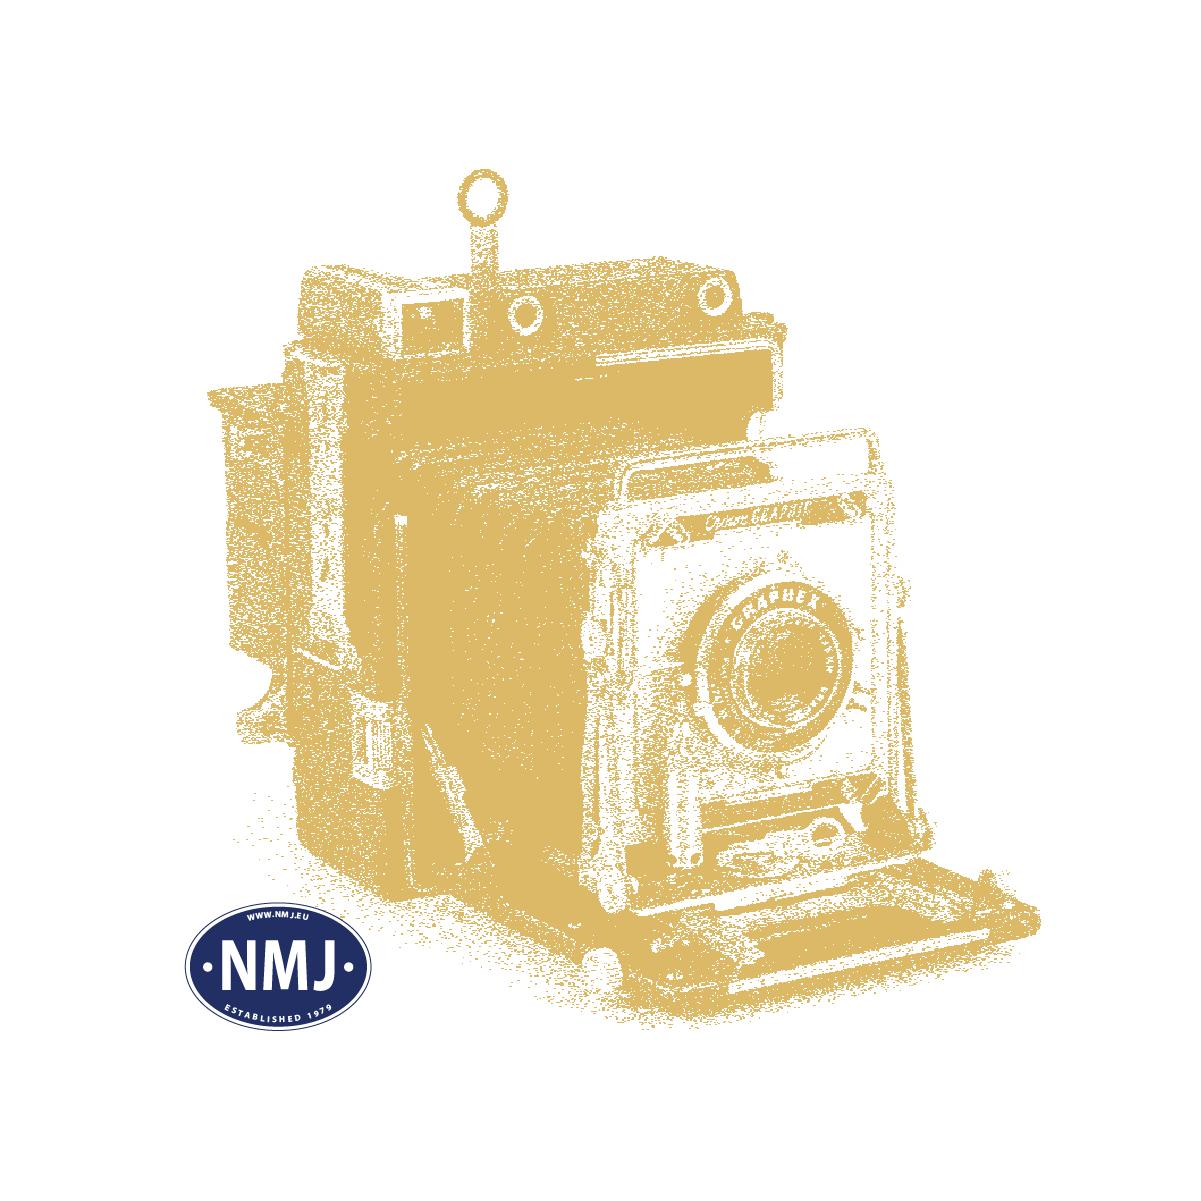 NMJ0T3-1 - NMJ Superline NSB T3 6539, 0-Scala